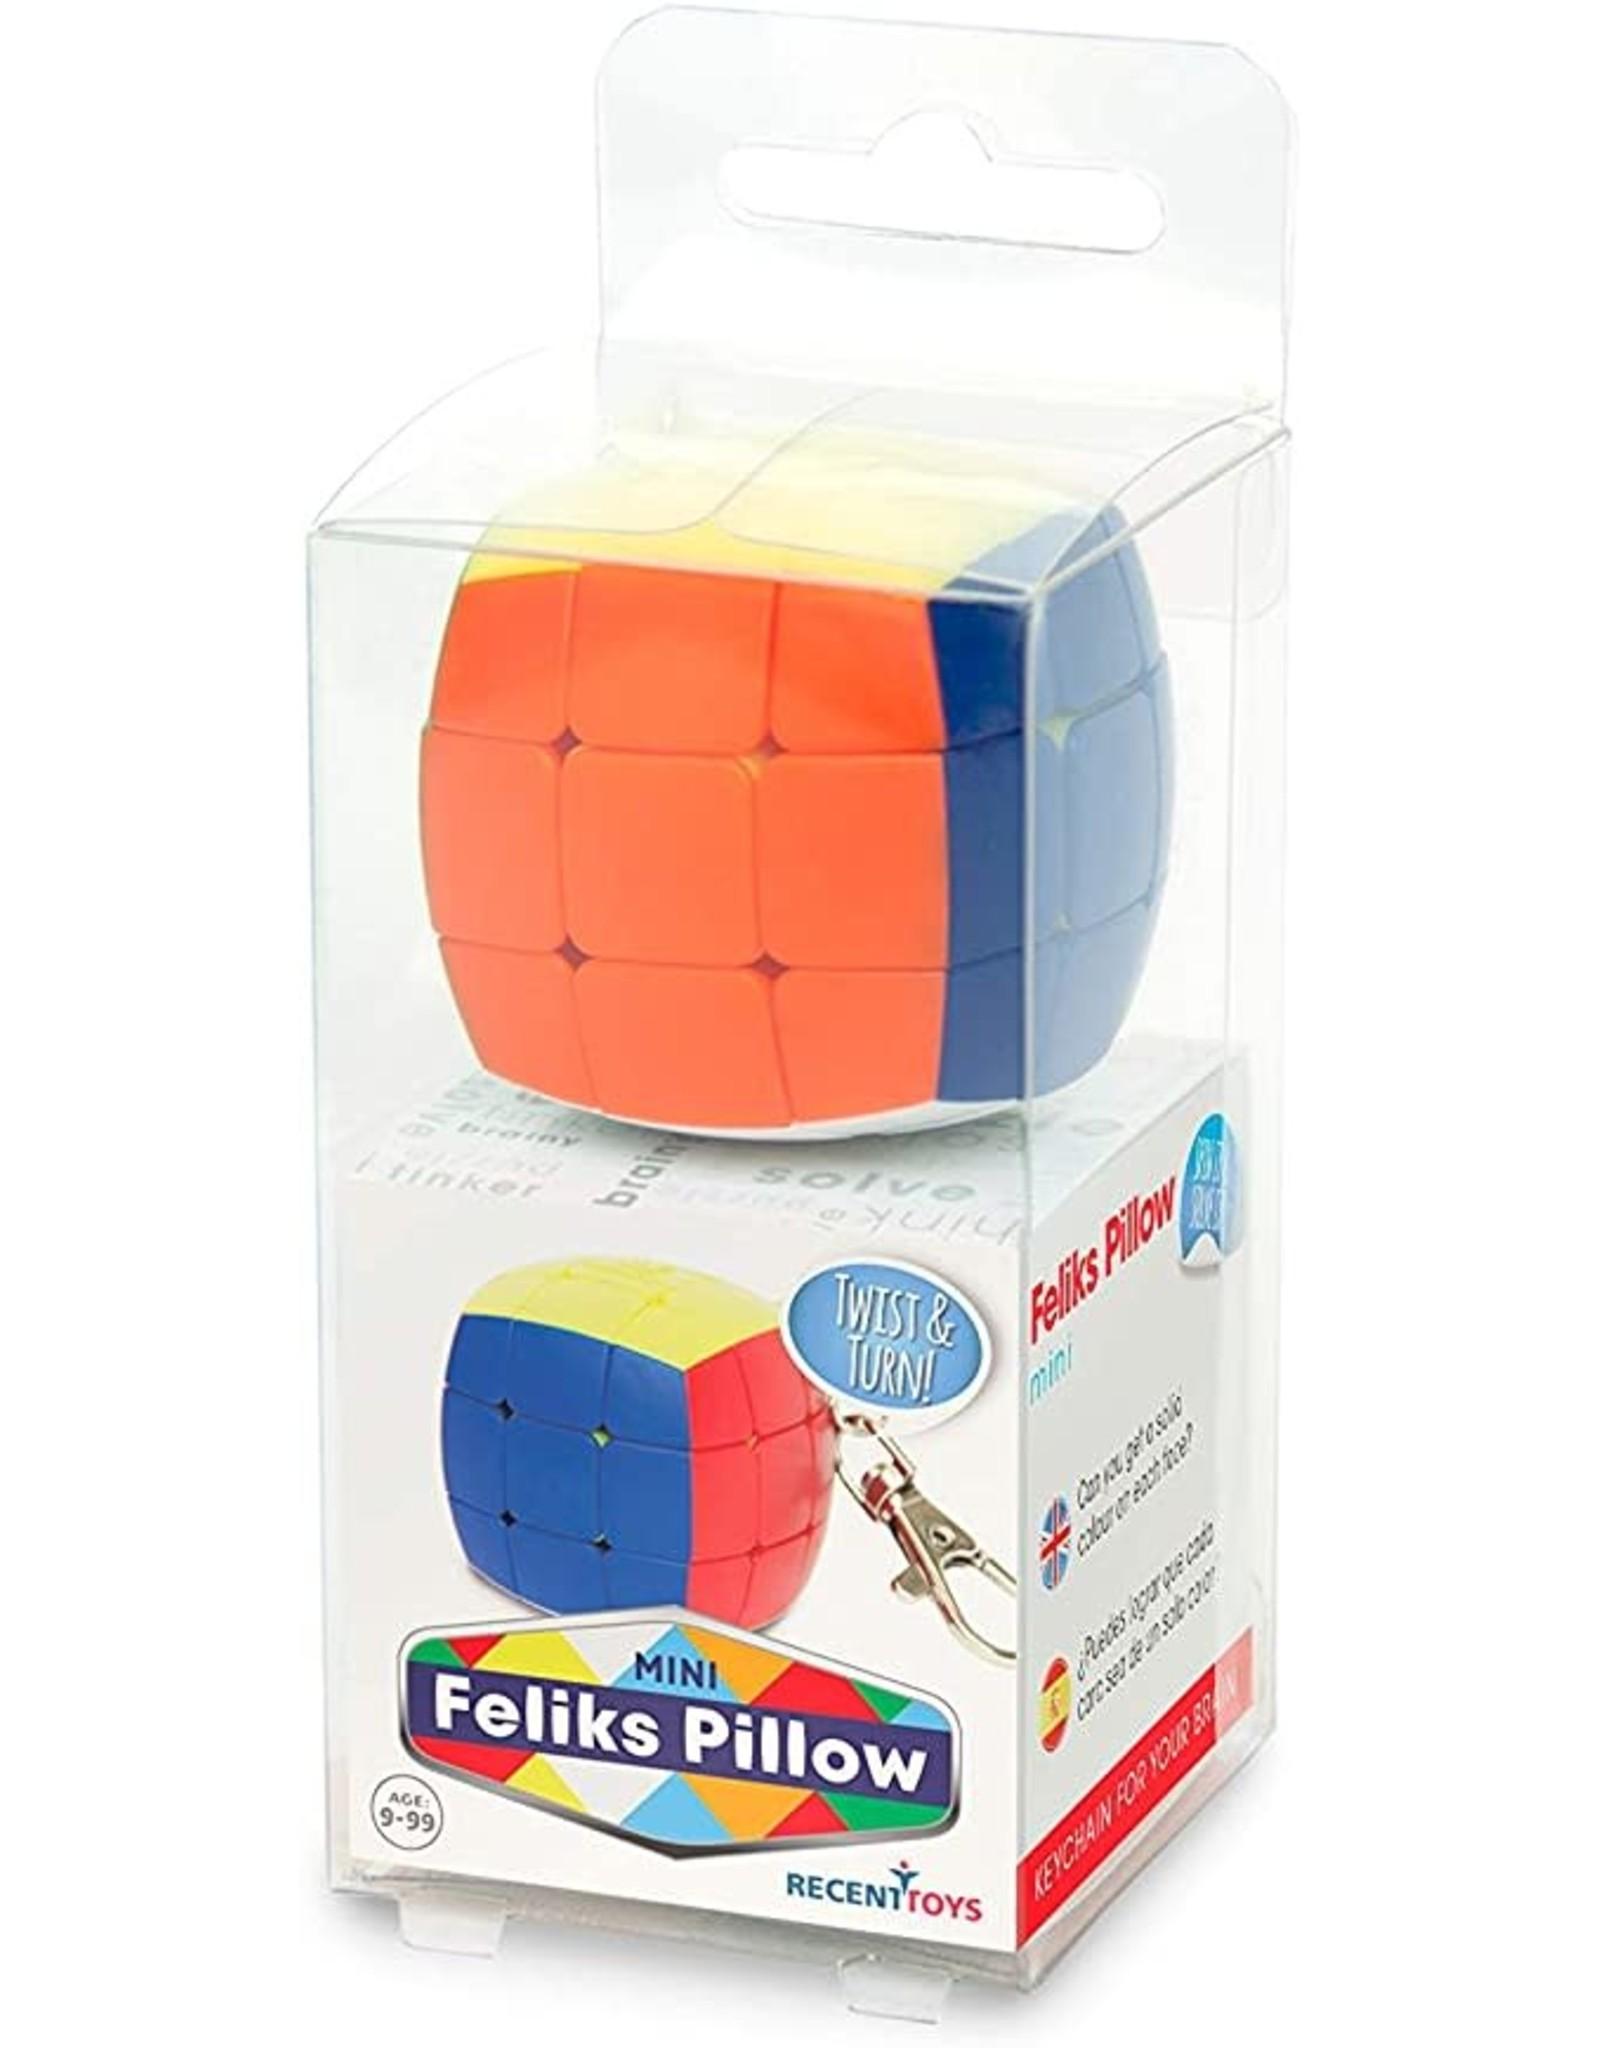 Recent Toys Mini Feliks Pillow